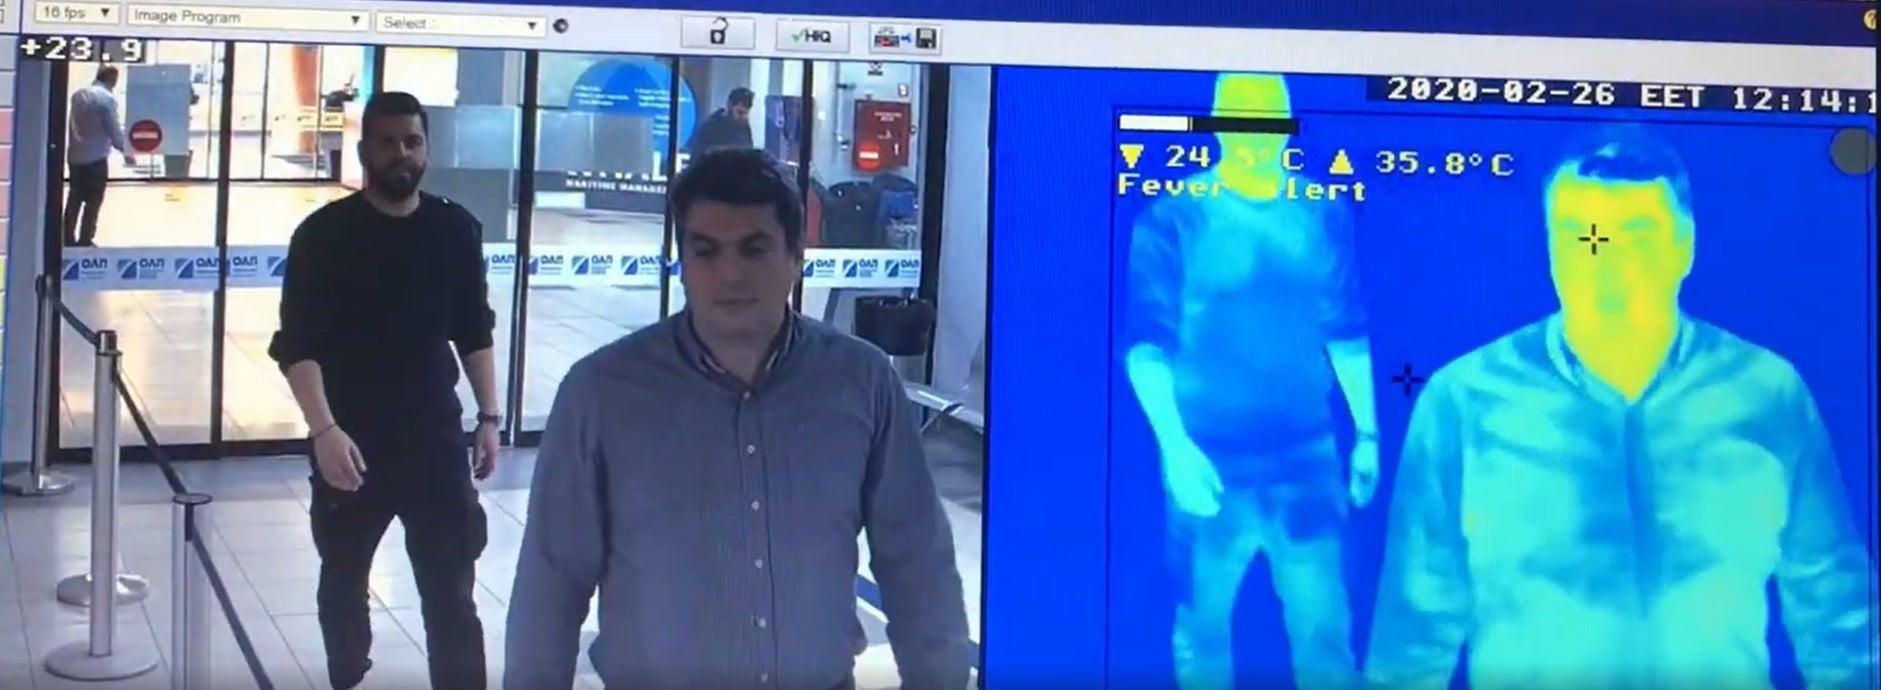 Mobotix Dual sensor camera with thermal and optical sensor